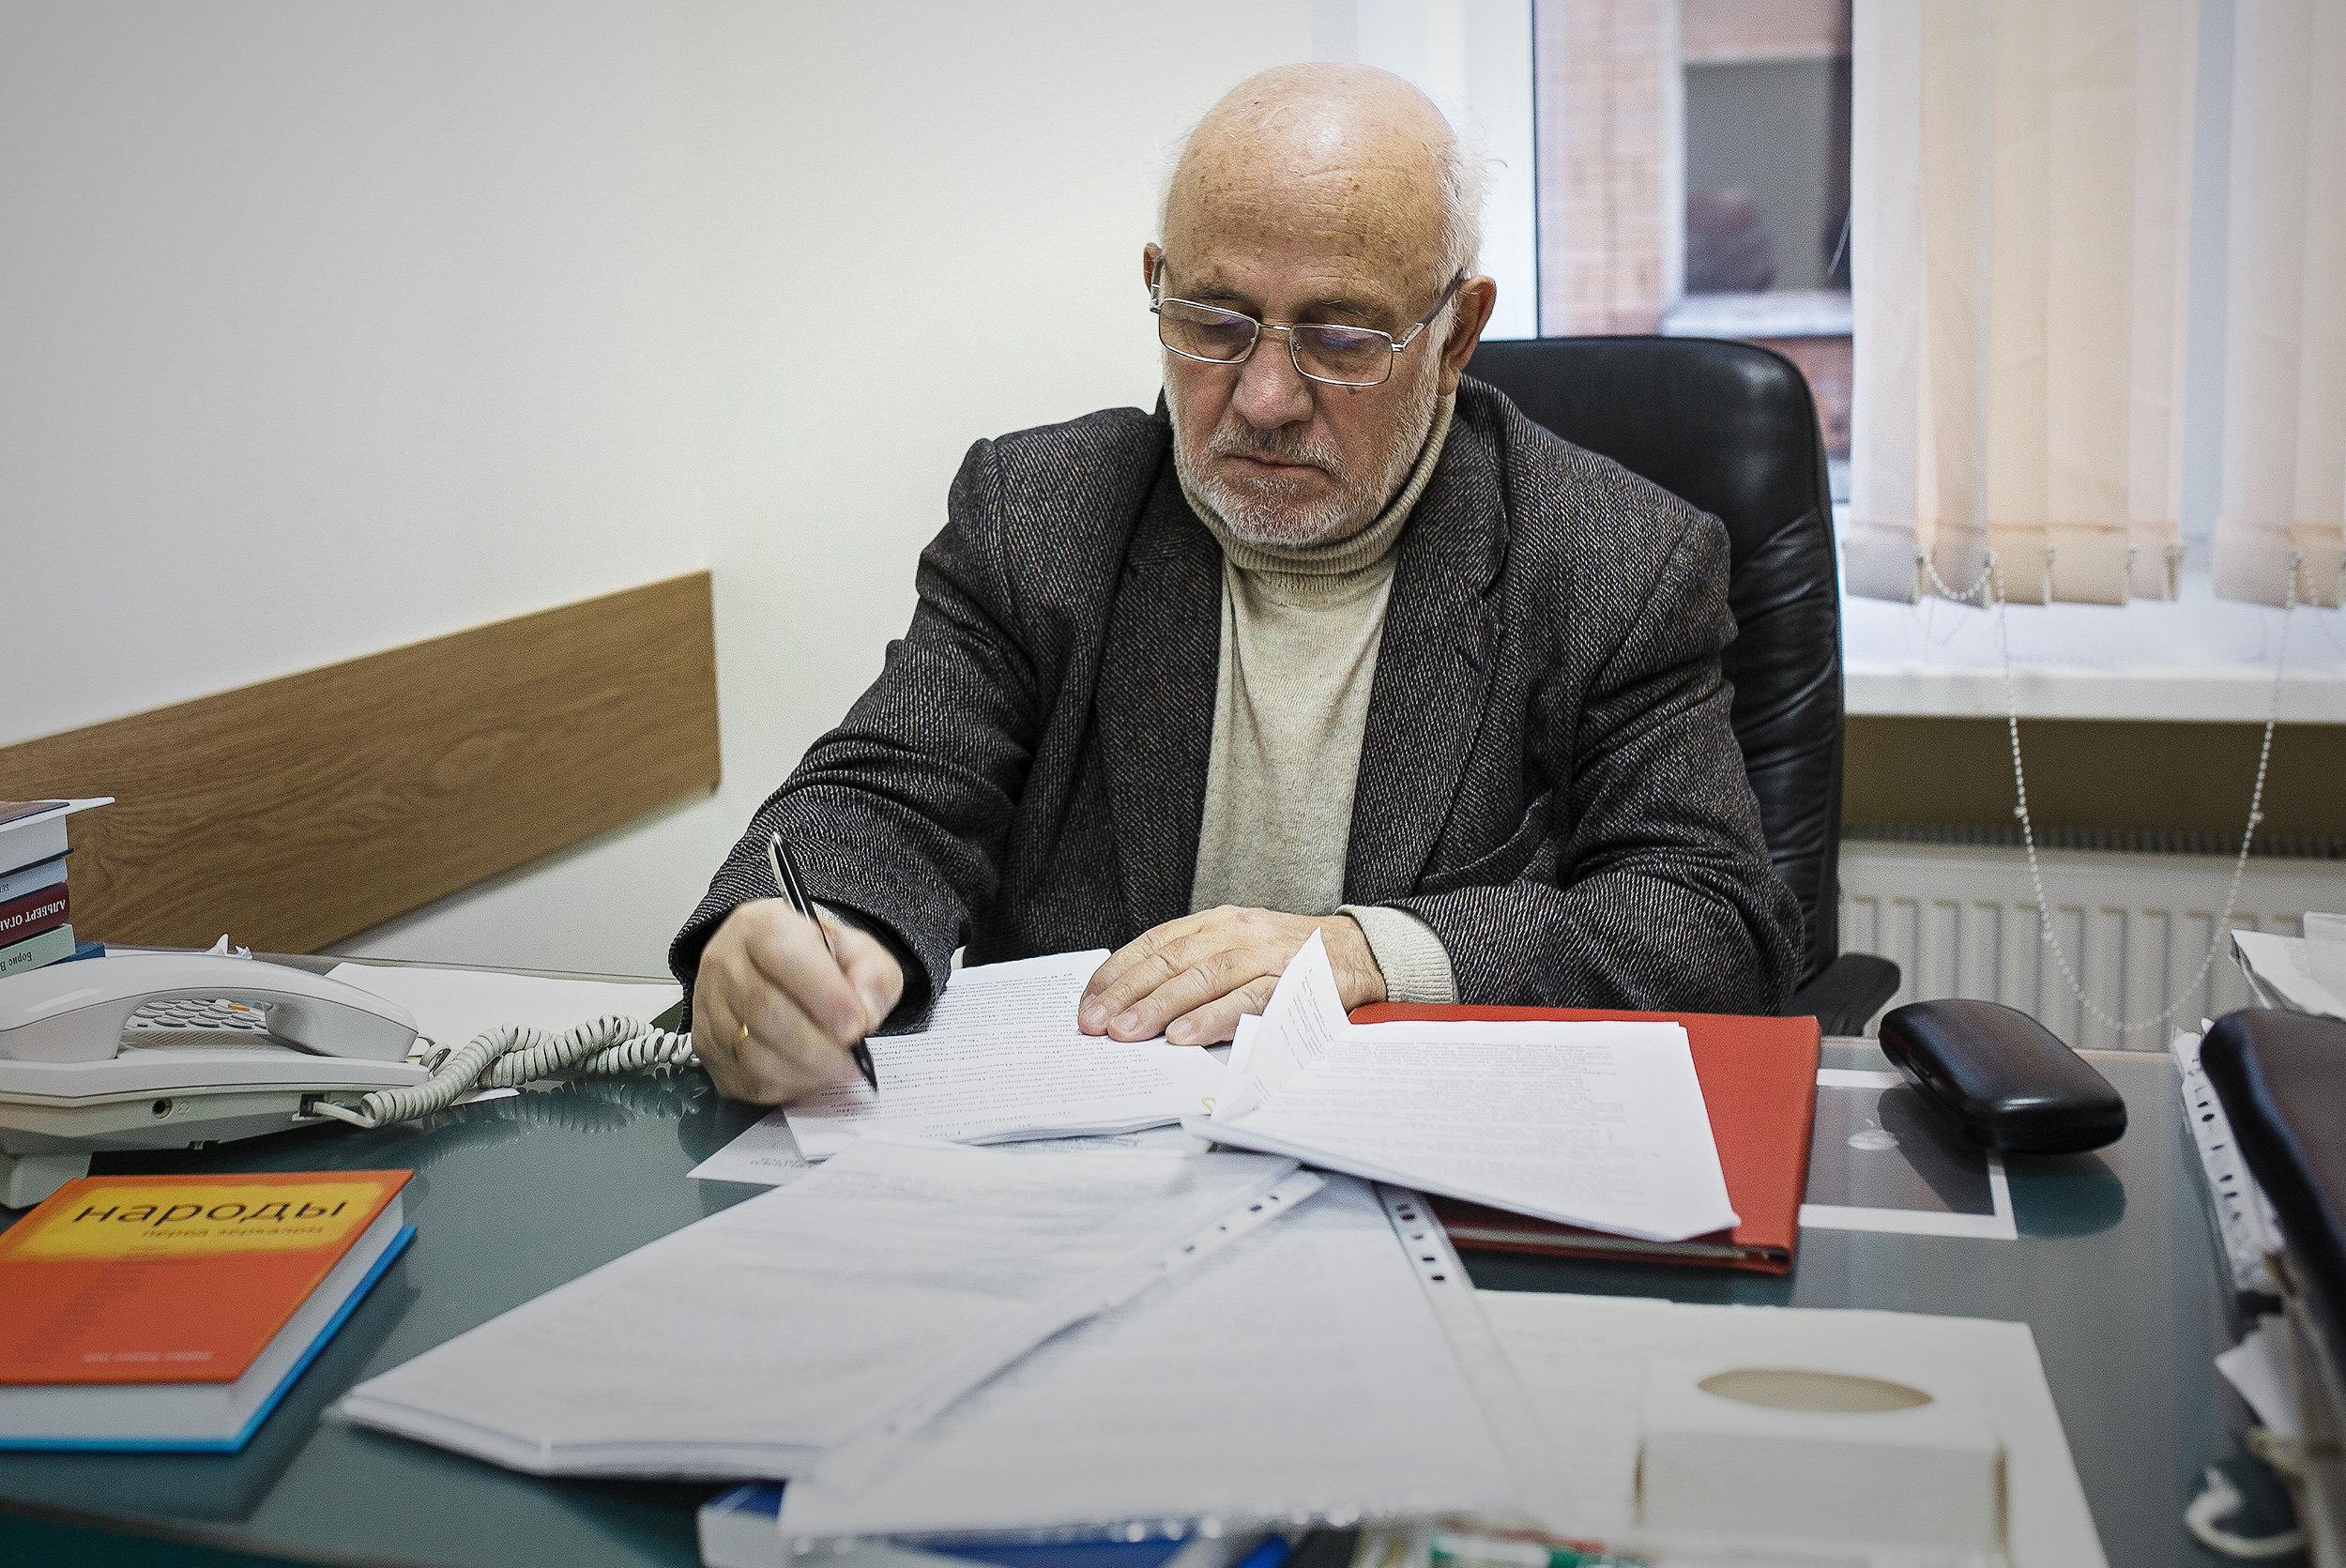 Главный редактор журнала Дружба народов Александр Эбаноидзе за работой